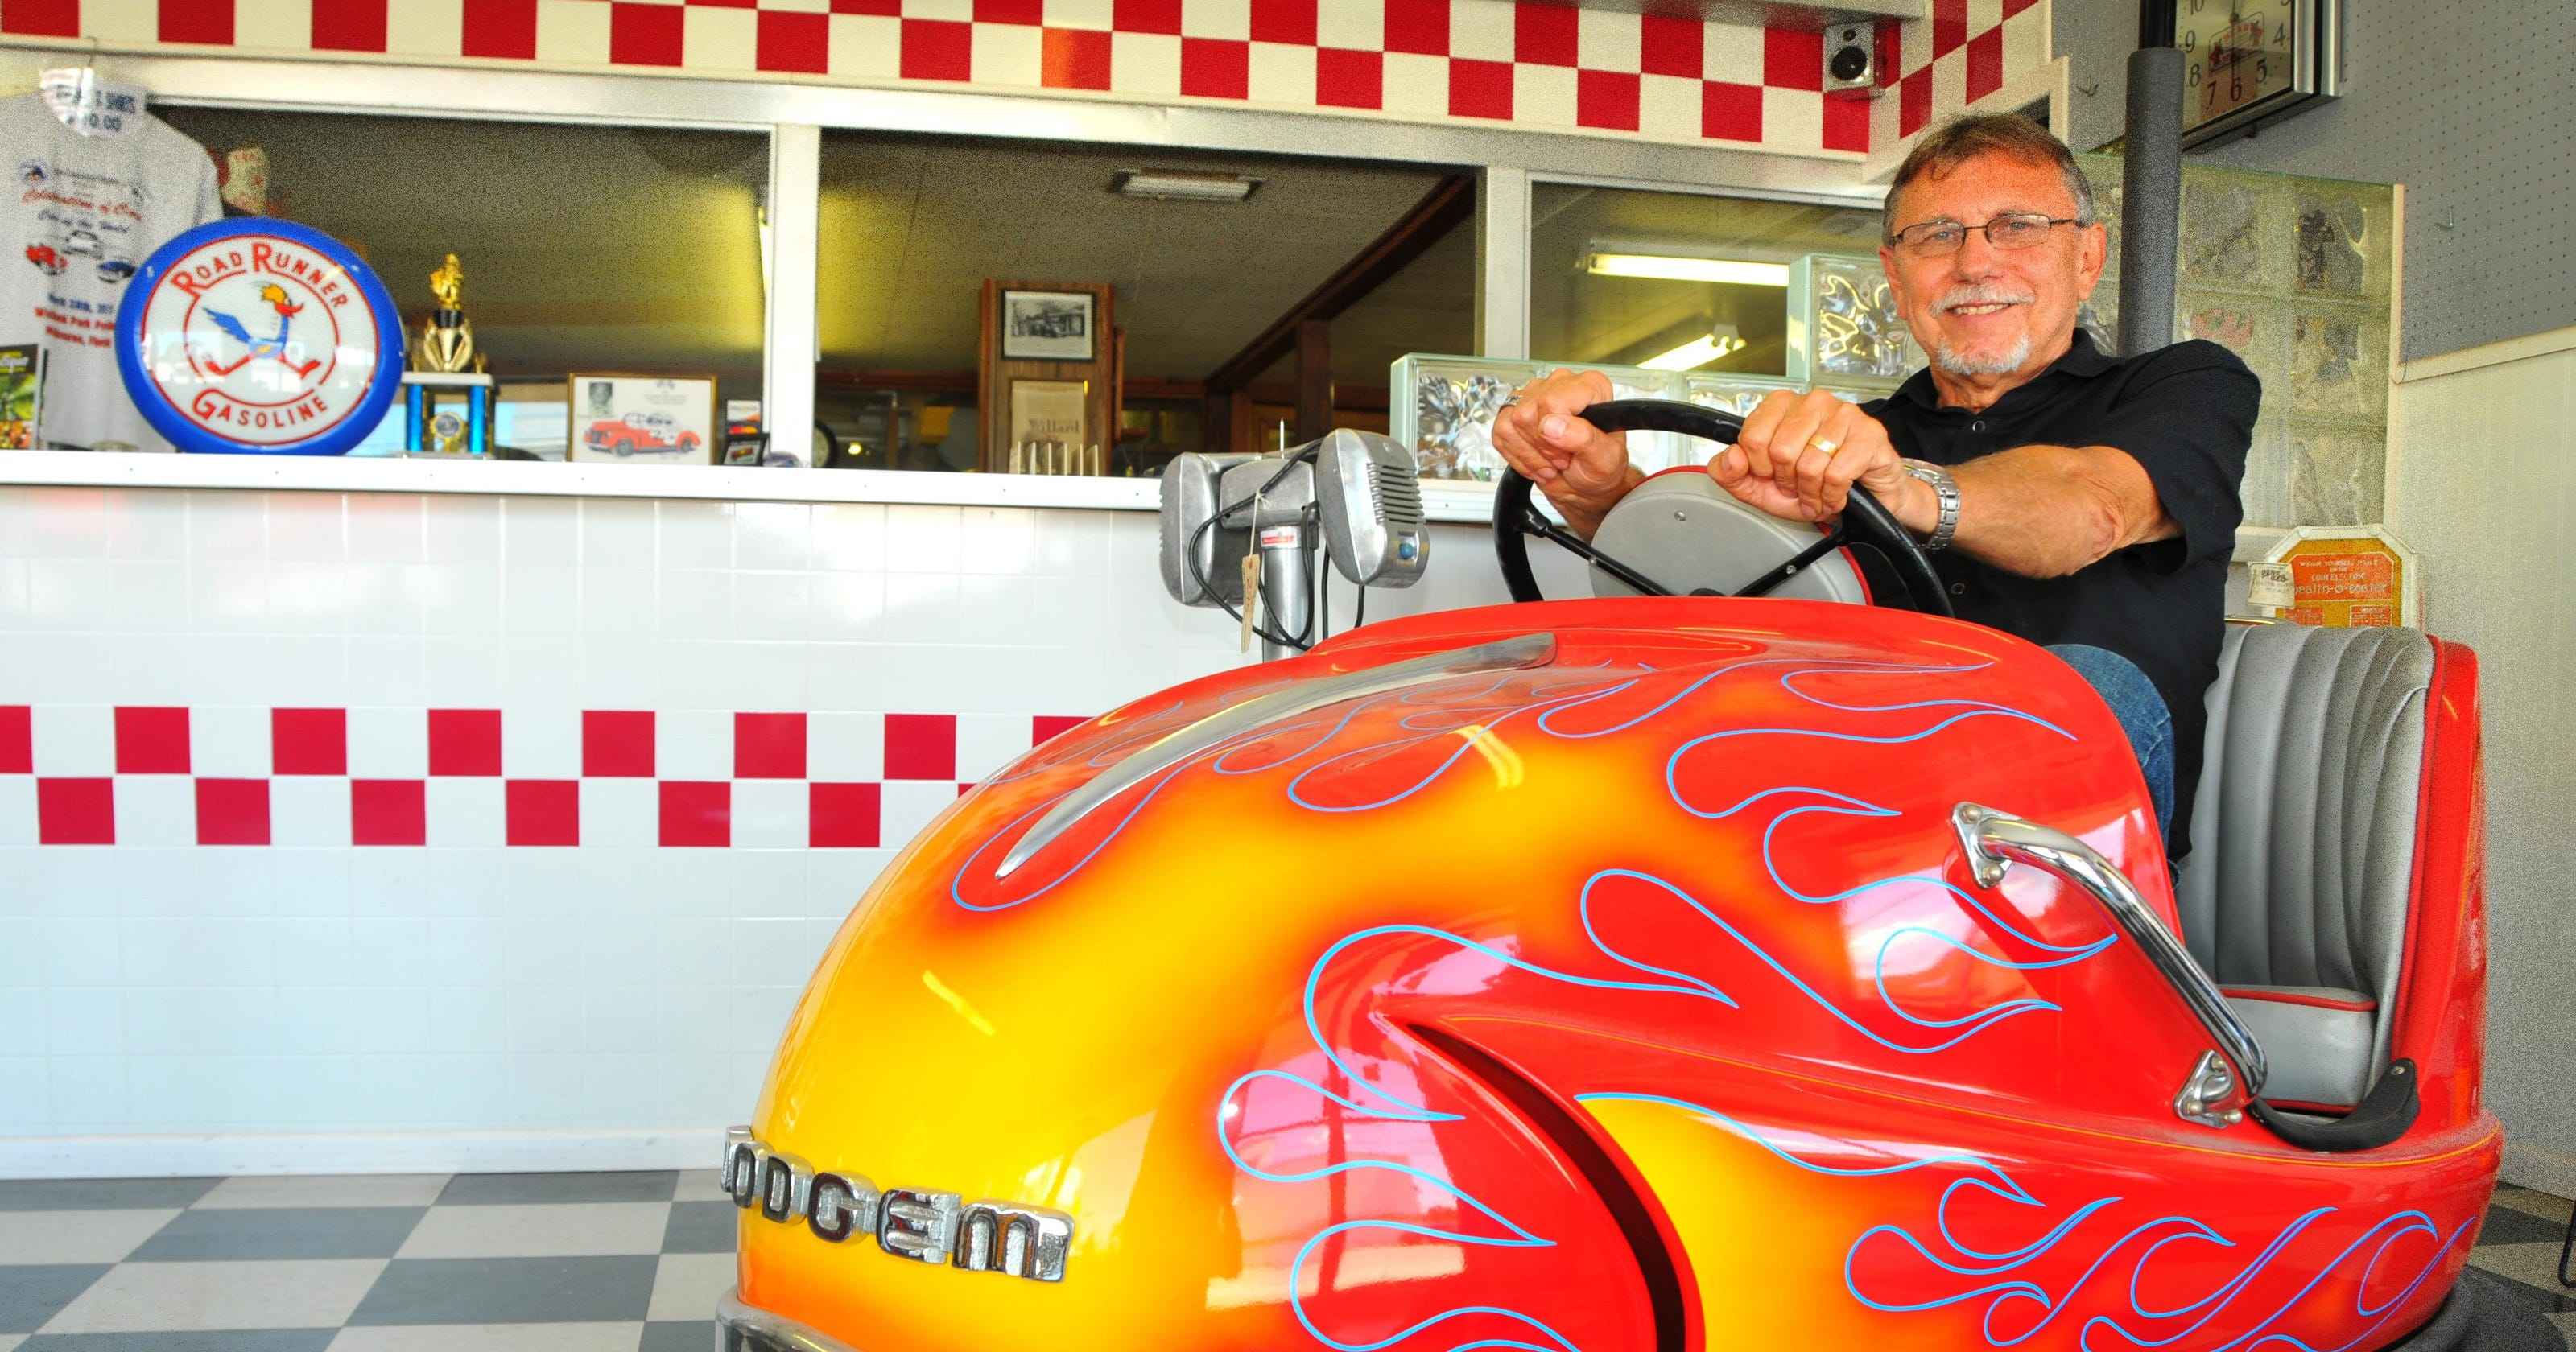 Cocoa shop restores vintage gas pumps and more